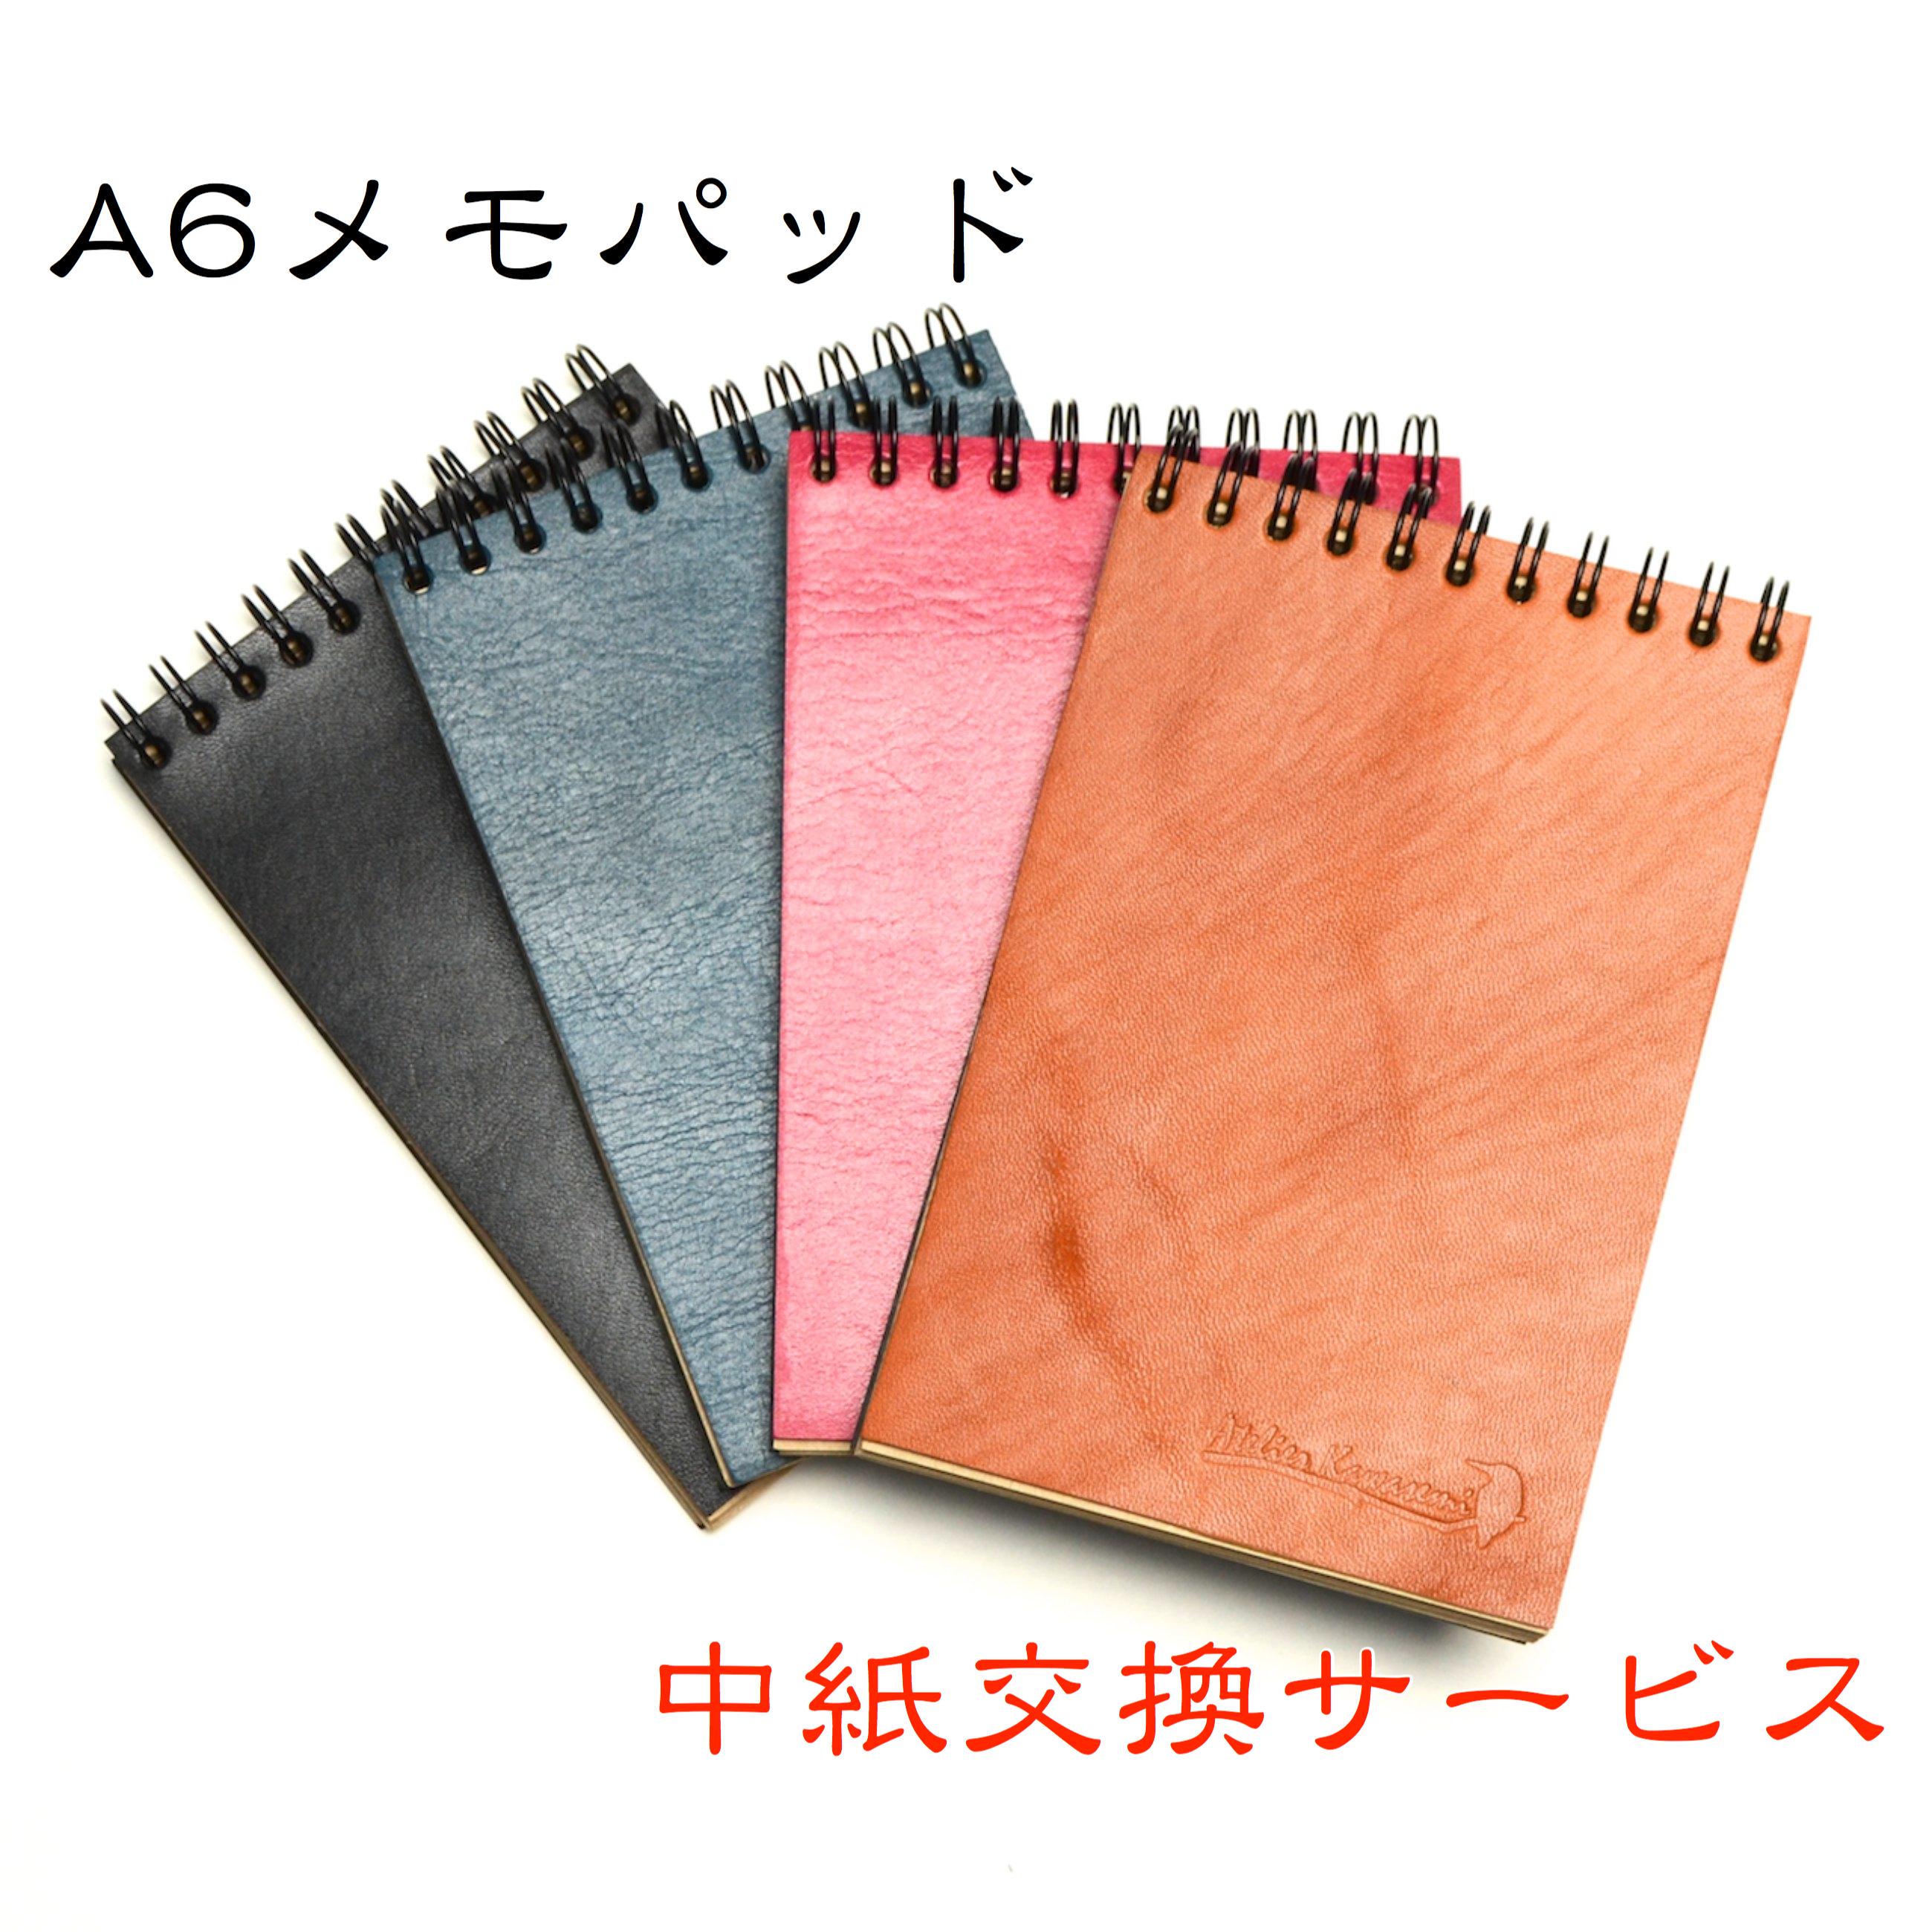 A6メモパッド中紙交換(中紙2セットとリングの色をお選びください。)